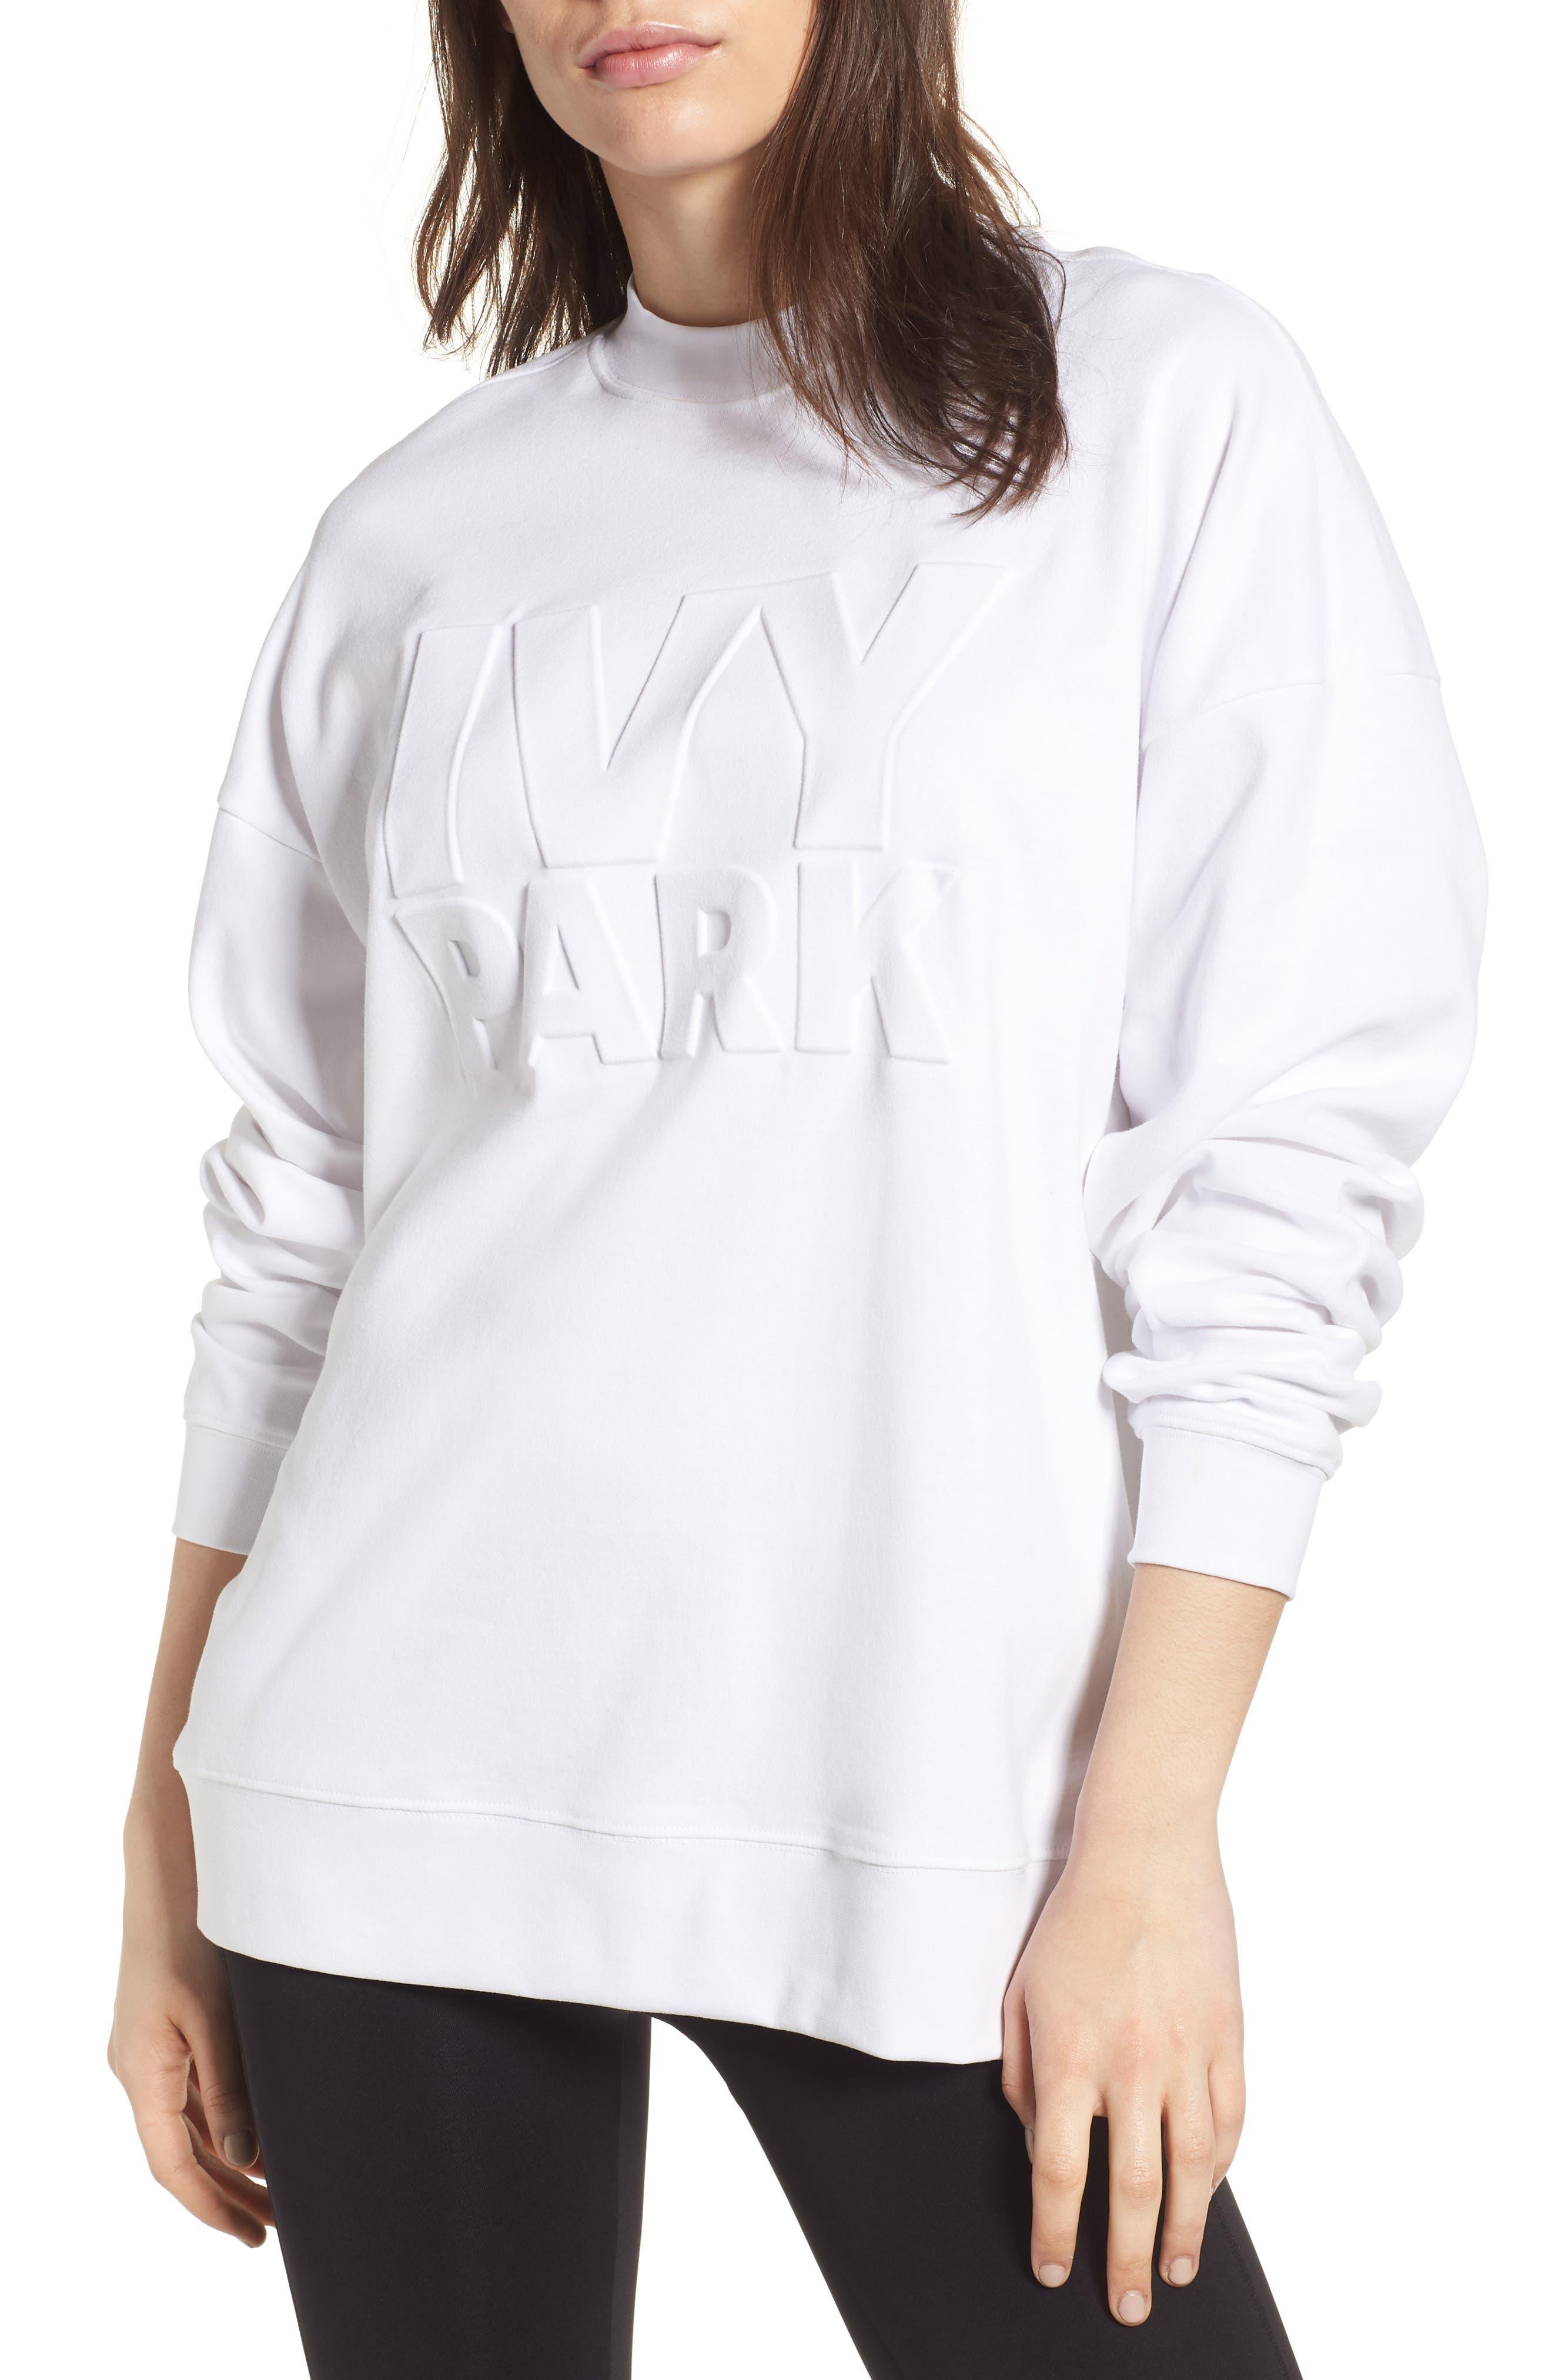 IVY PARK® Embossed Logo Crew Sweatshirt